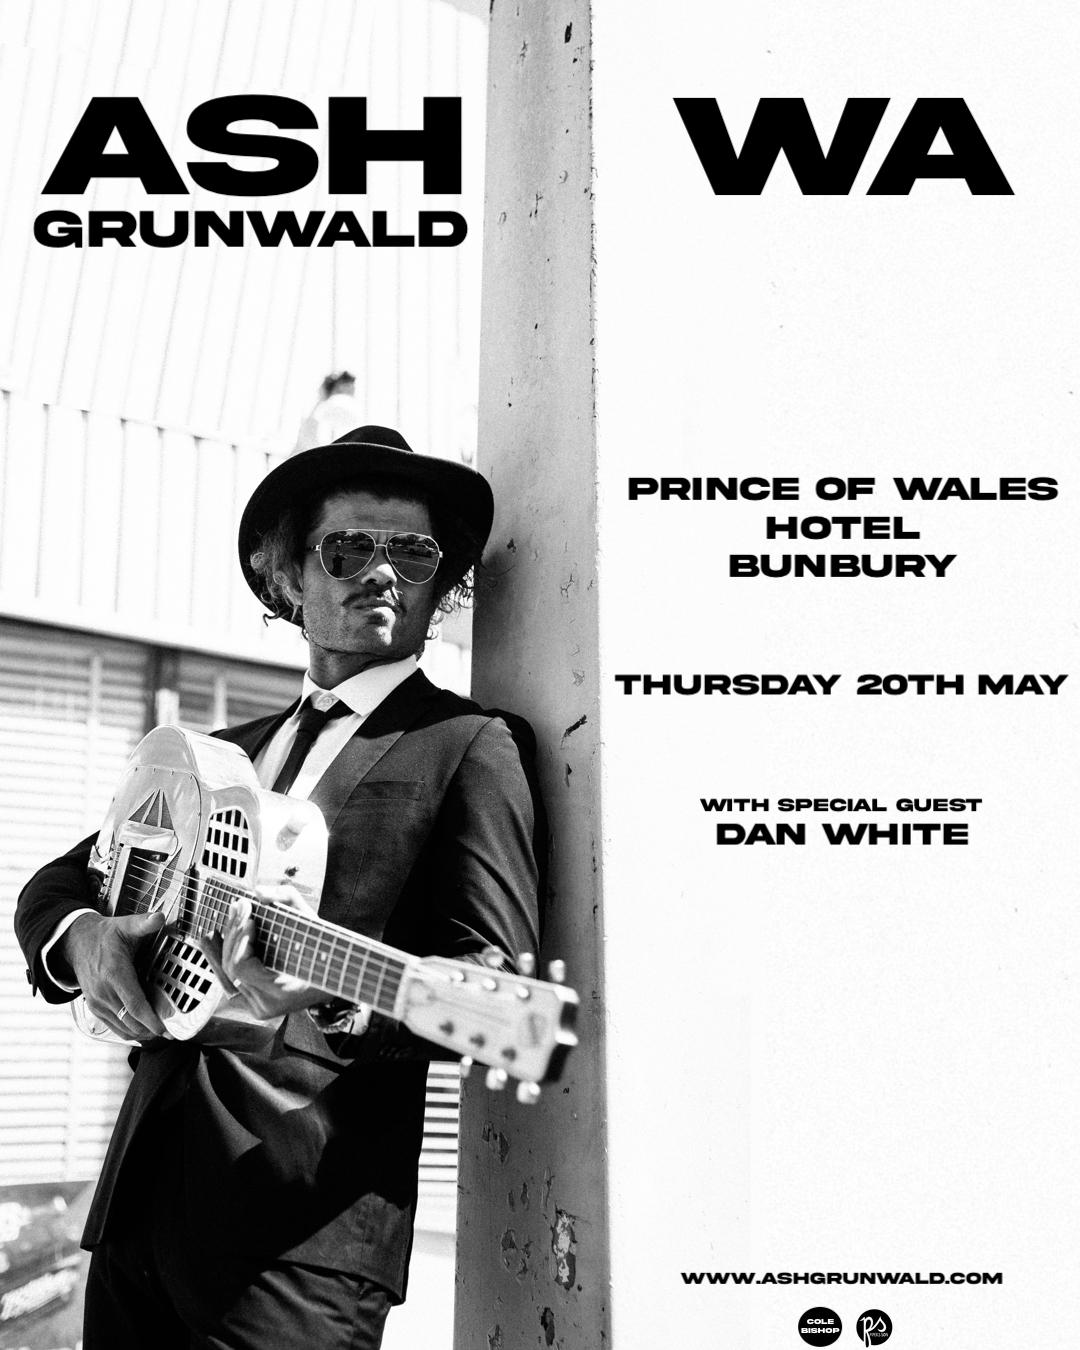 WA SHOWS - Prince of Wales Bunbury - Feed Poster - Ash Grunwald